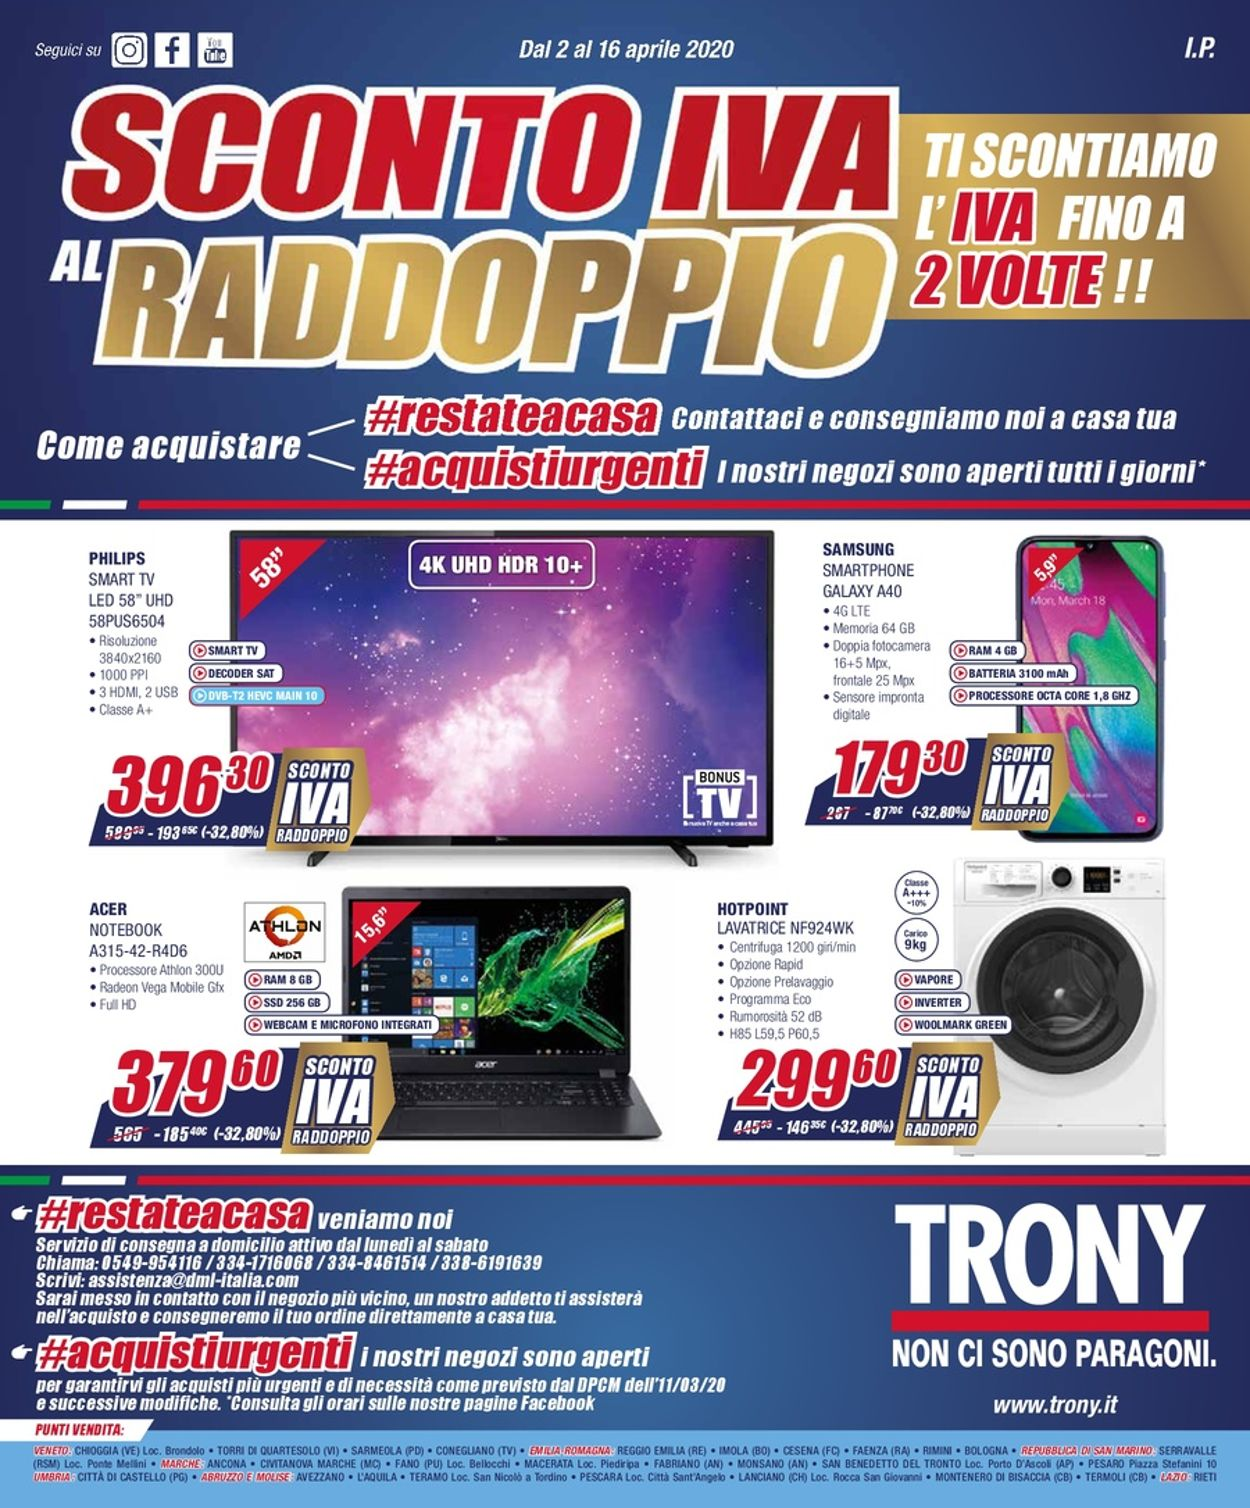 Volantino Trony - Offerte 02/04-16/04/2020